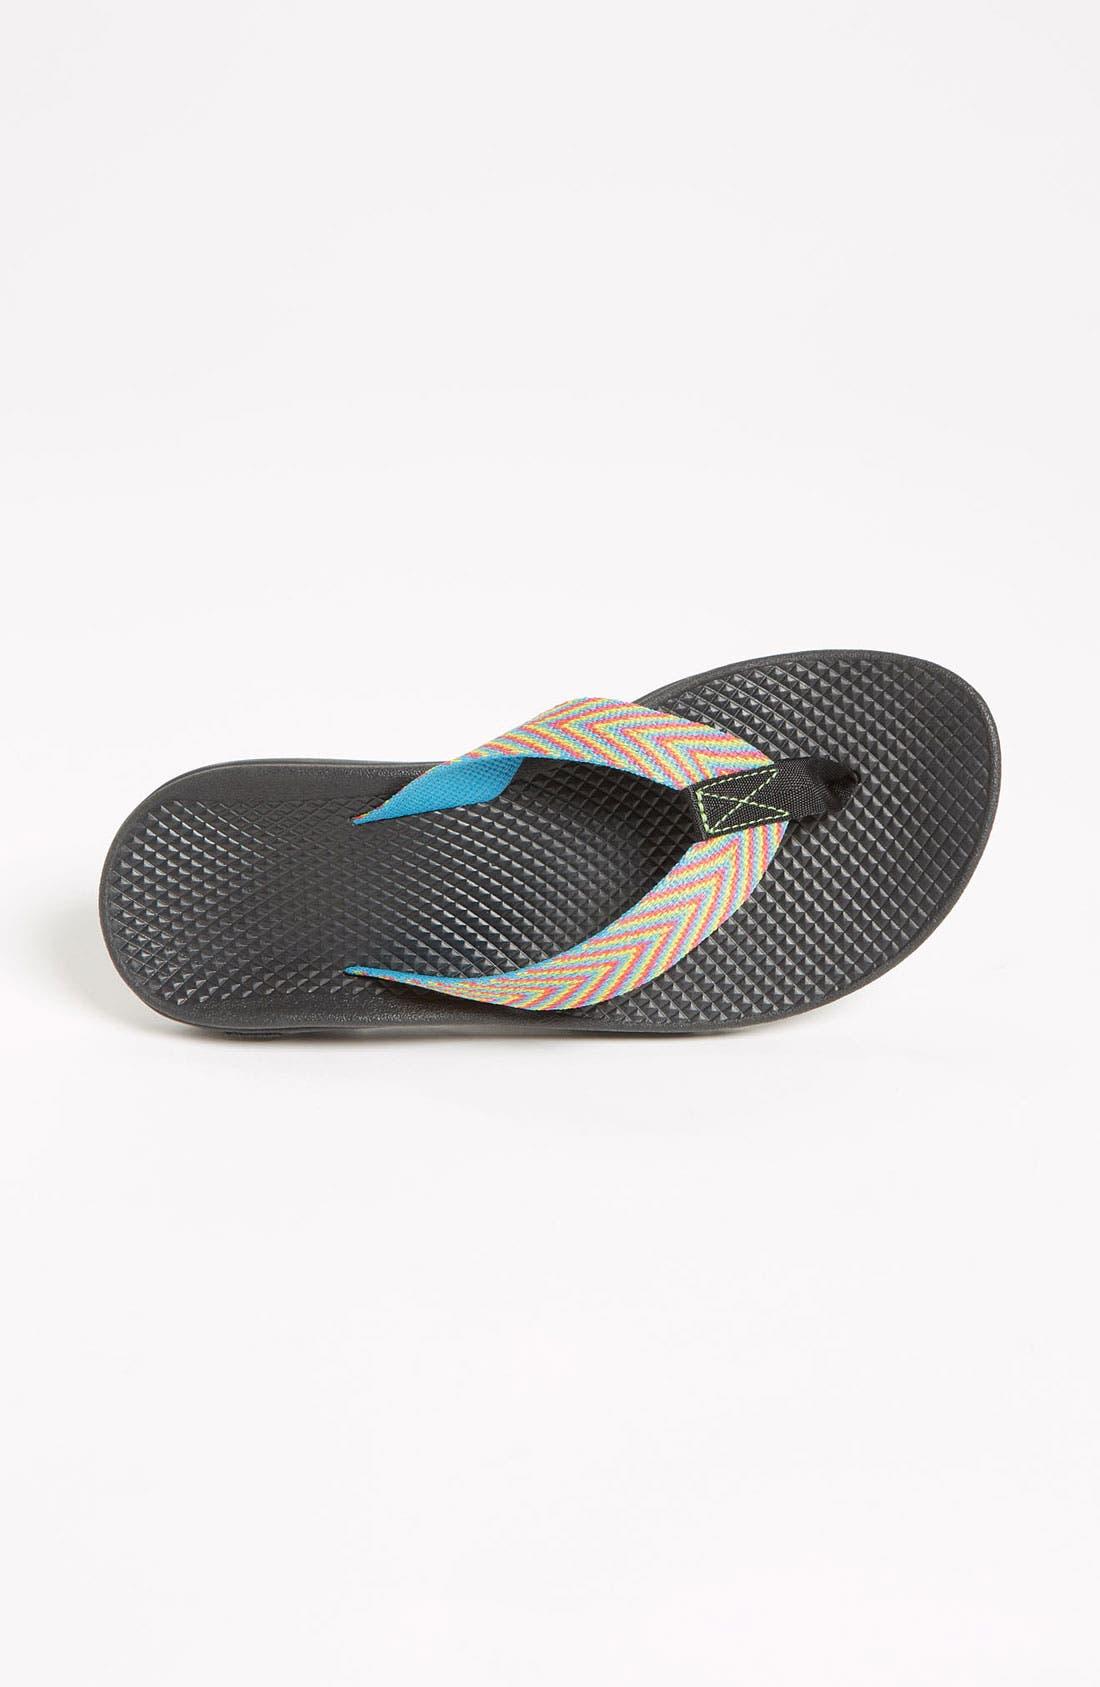 Alternate Image 3  - Chaco 'Flip Vibe' Sandal